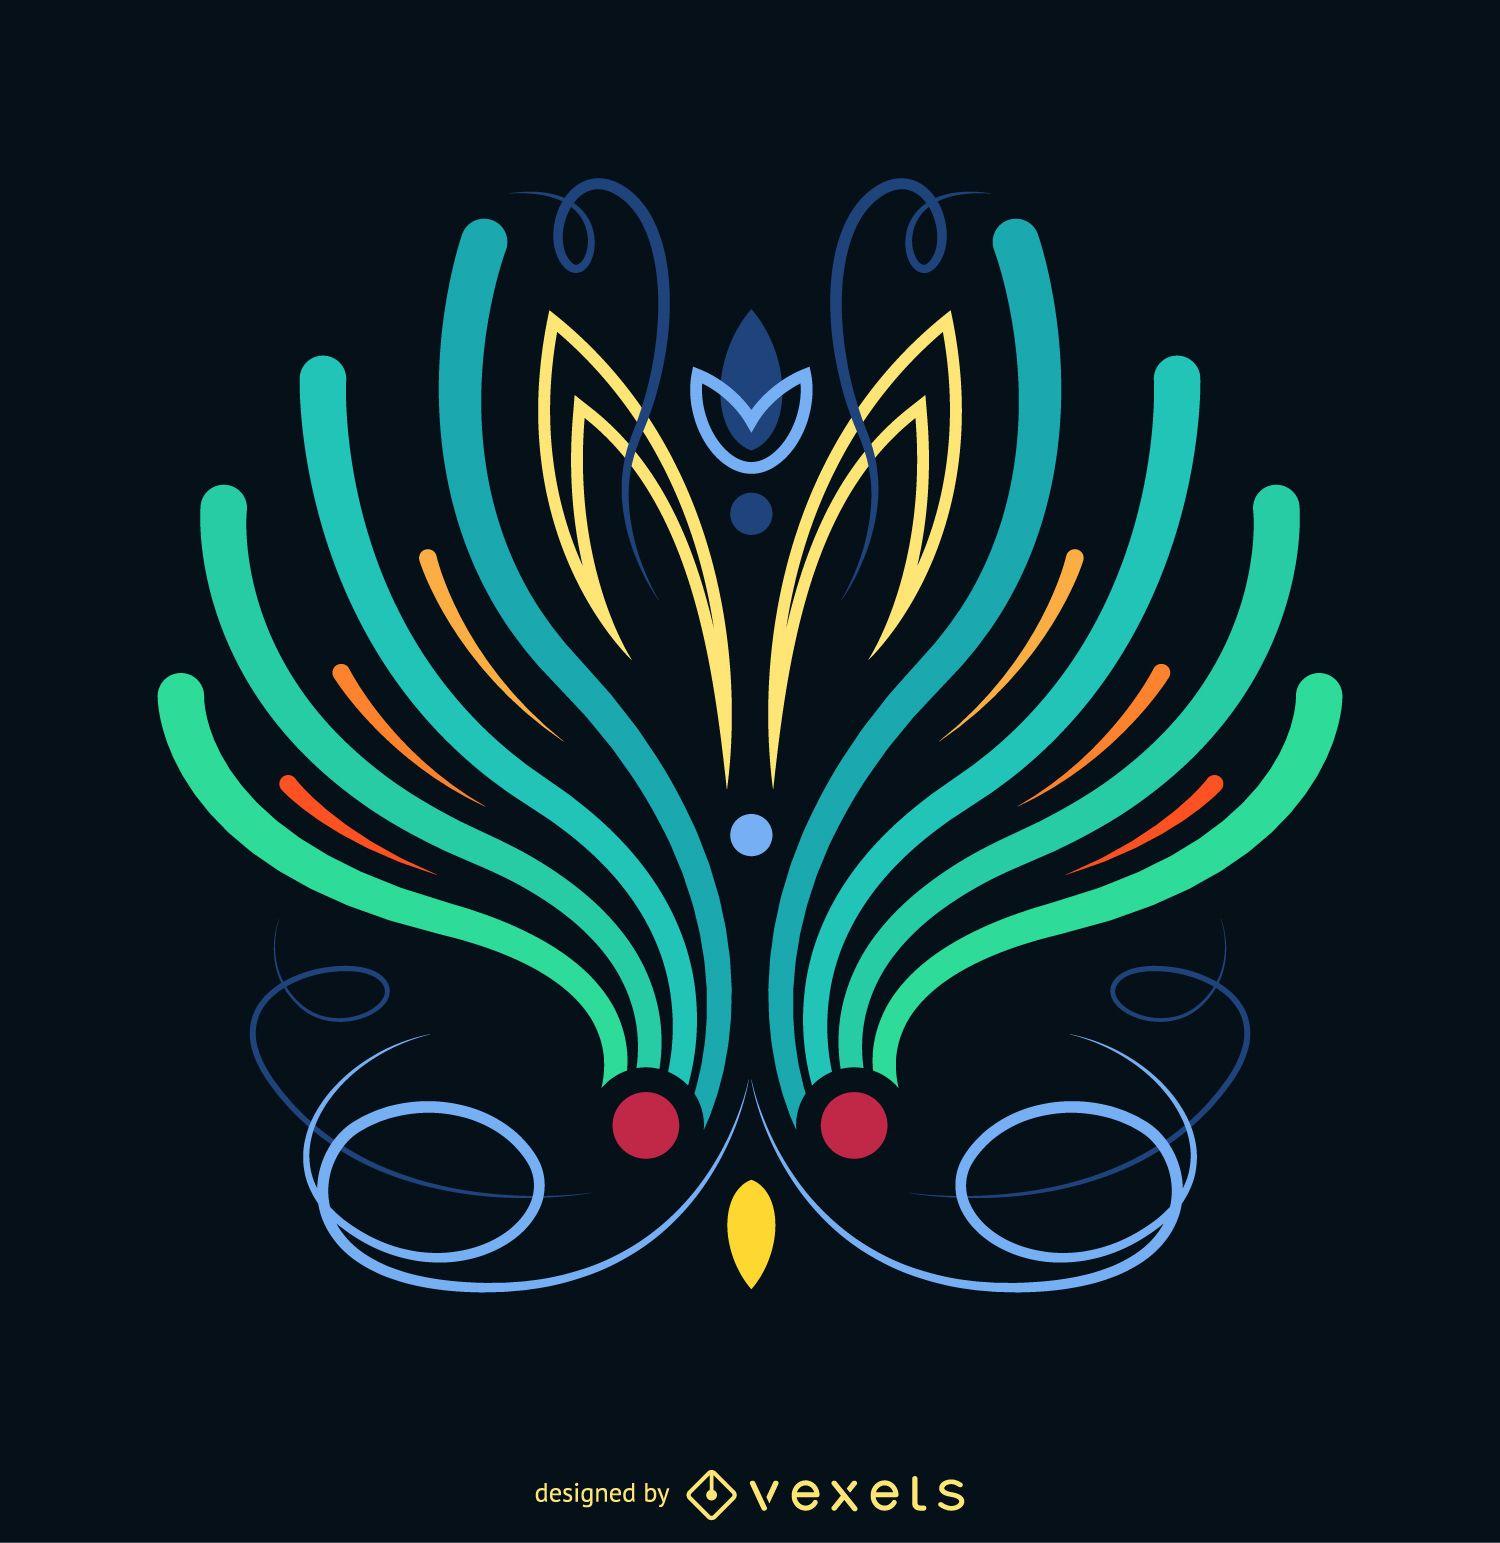 Pinstripe illustration poster